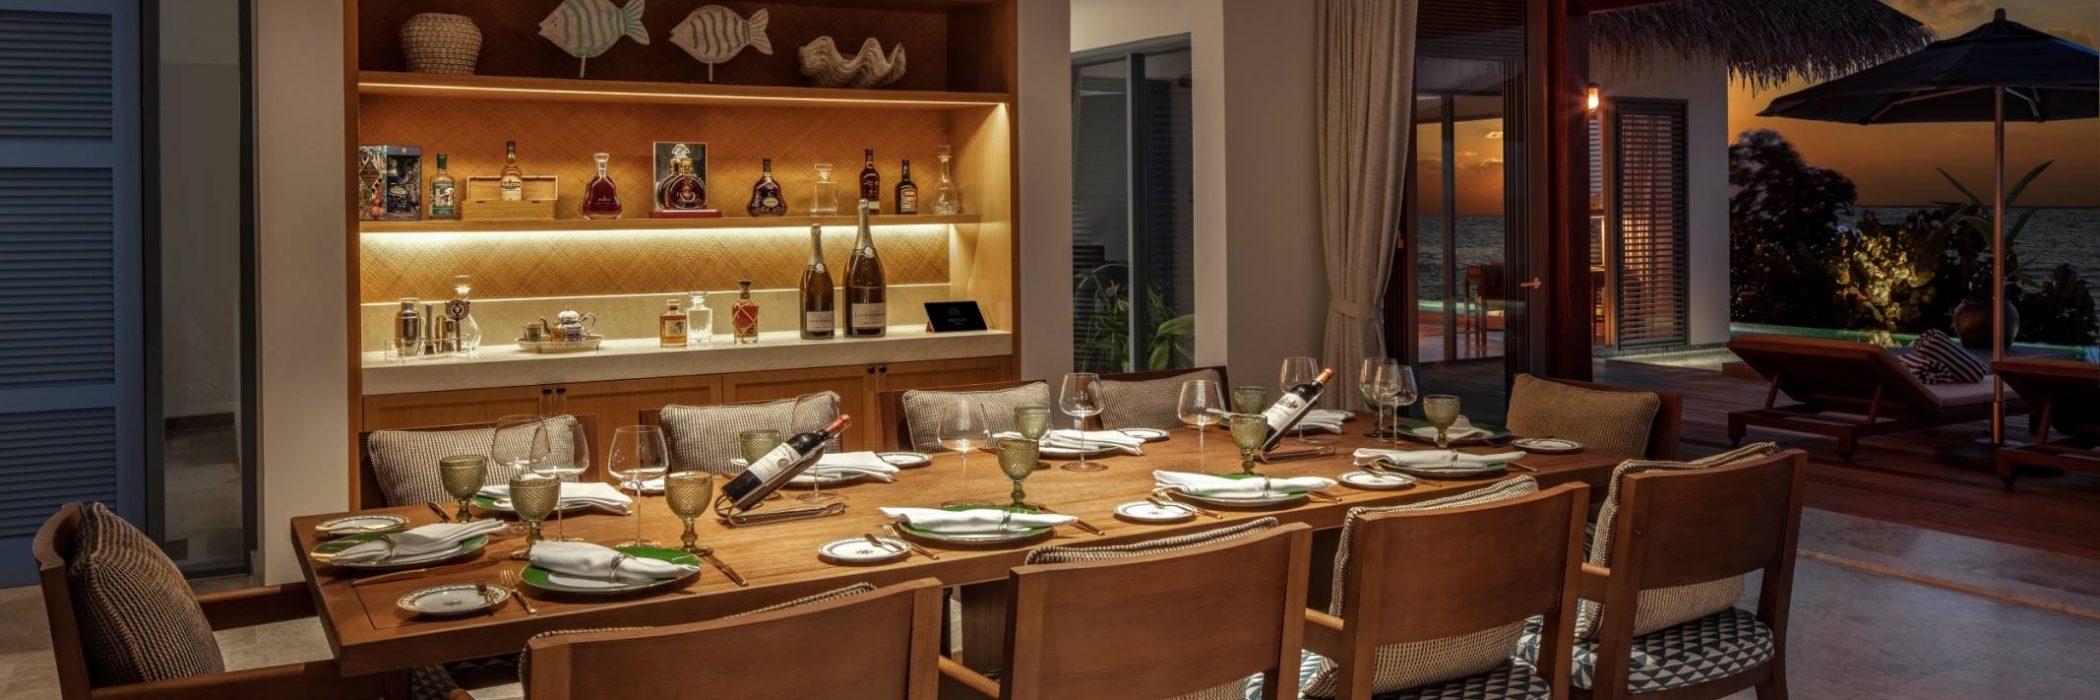 Raffles Maldives Meradhoo - Introducing Chef Joseph William Talbot our Executive Sous Chef